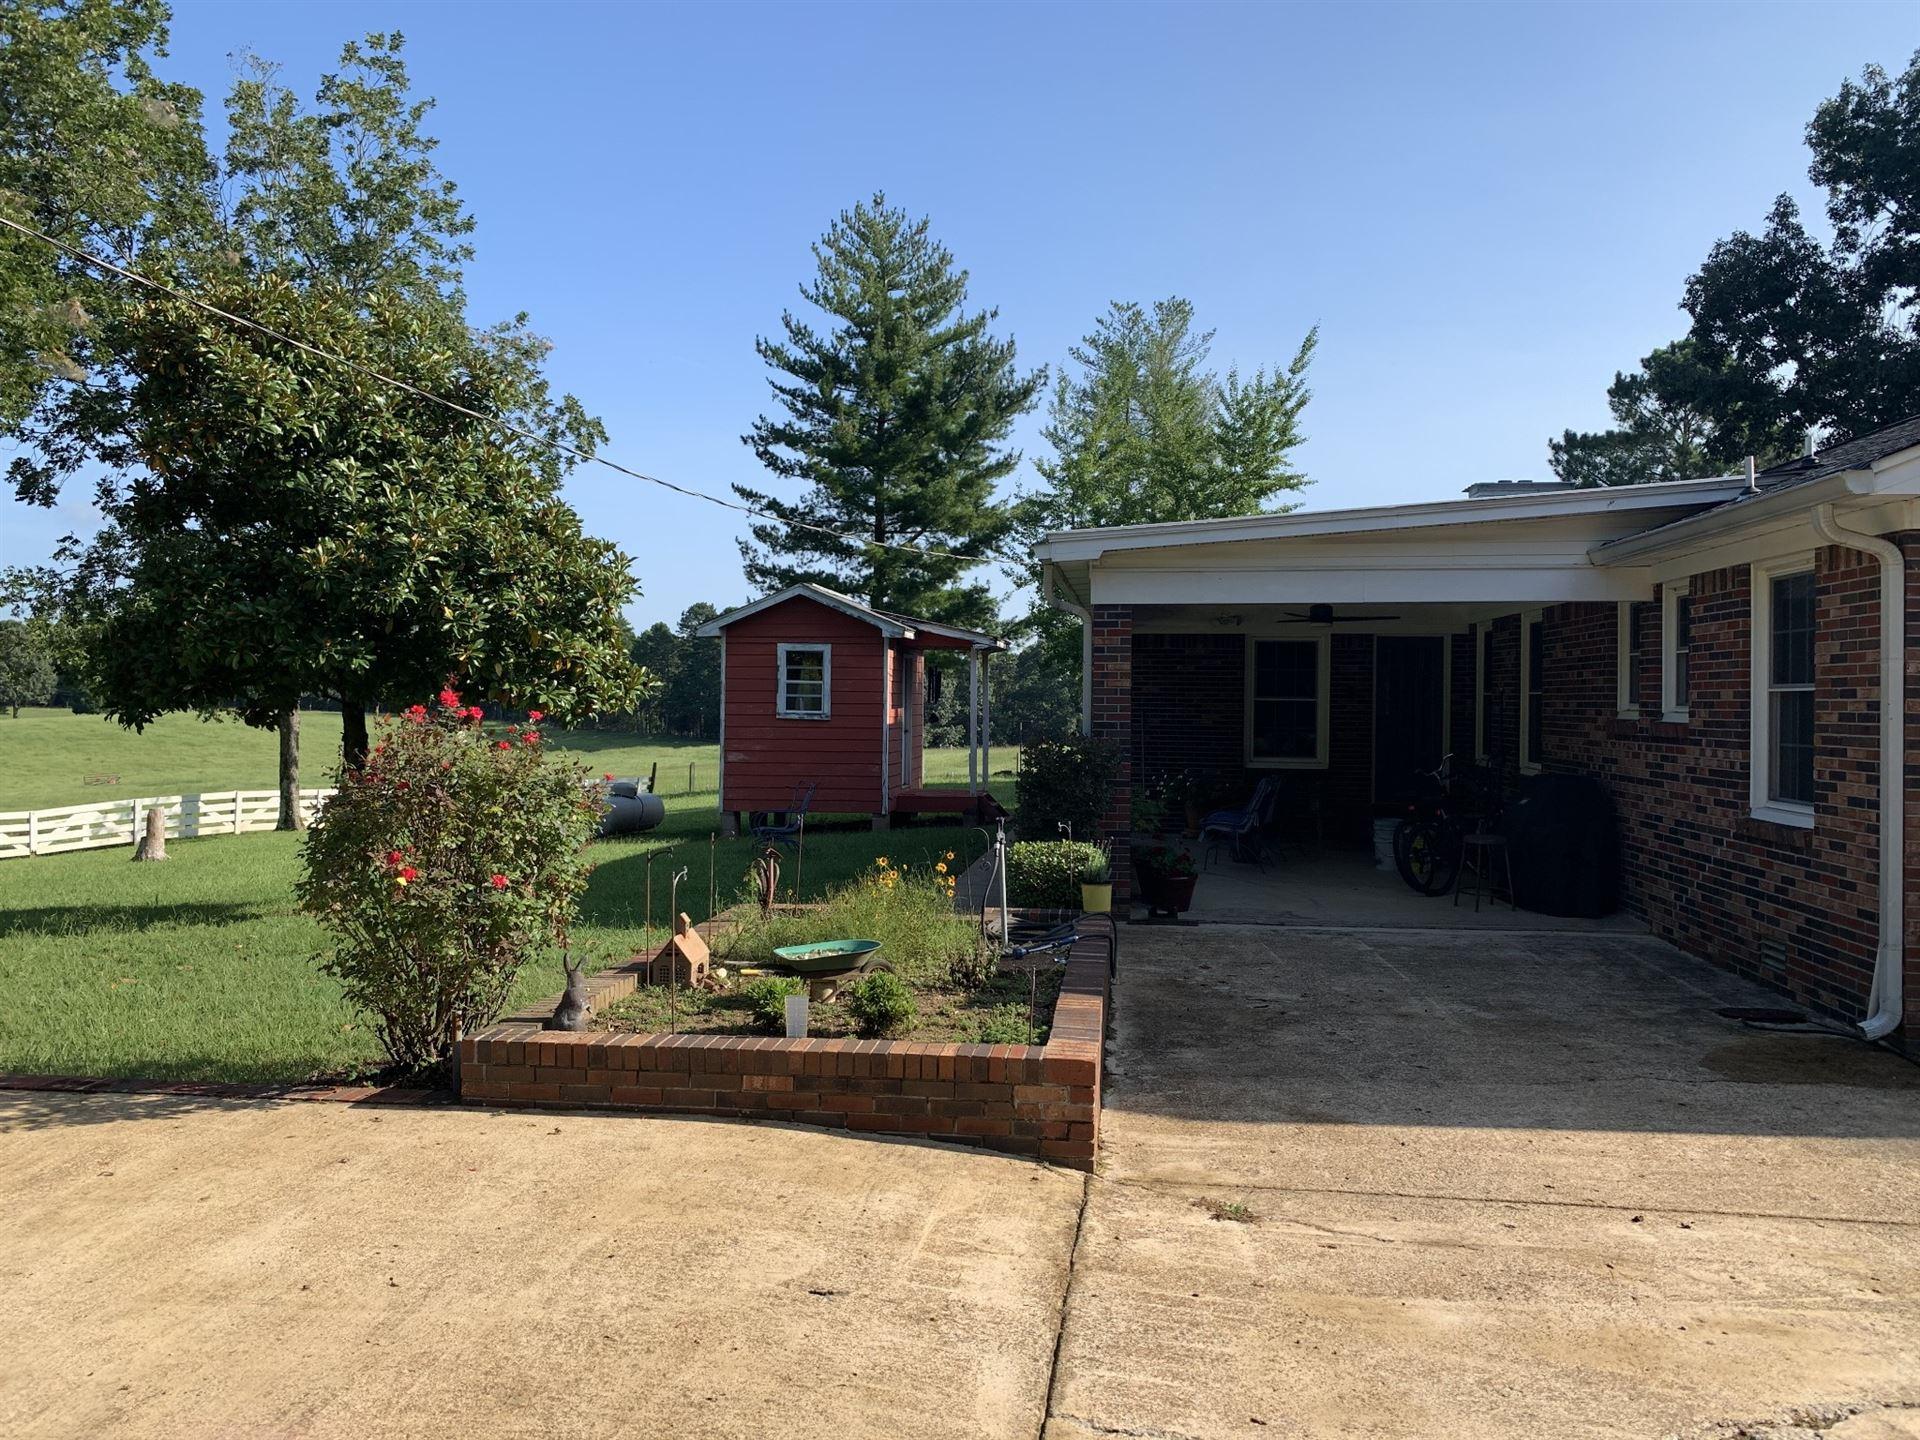 Photo of 3780 Bethesda Rd, Selmer, TN 38375 (MLS # 2193216)